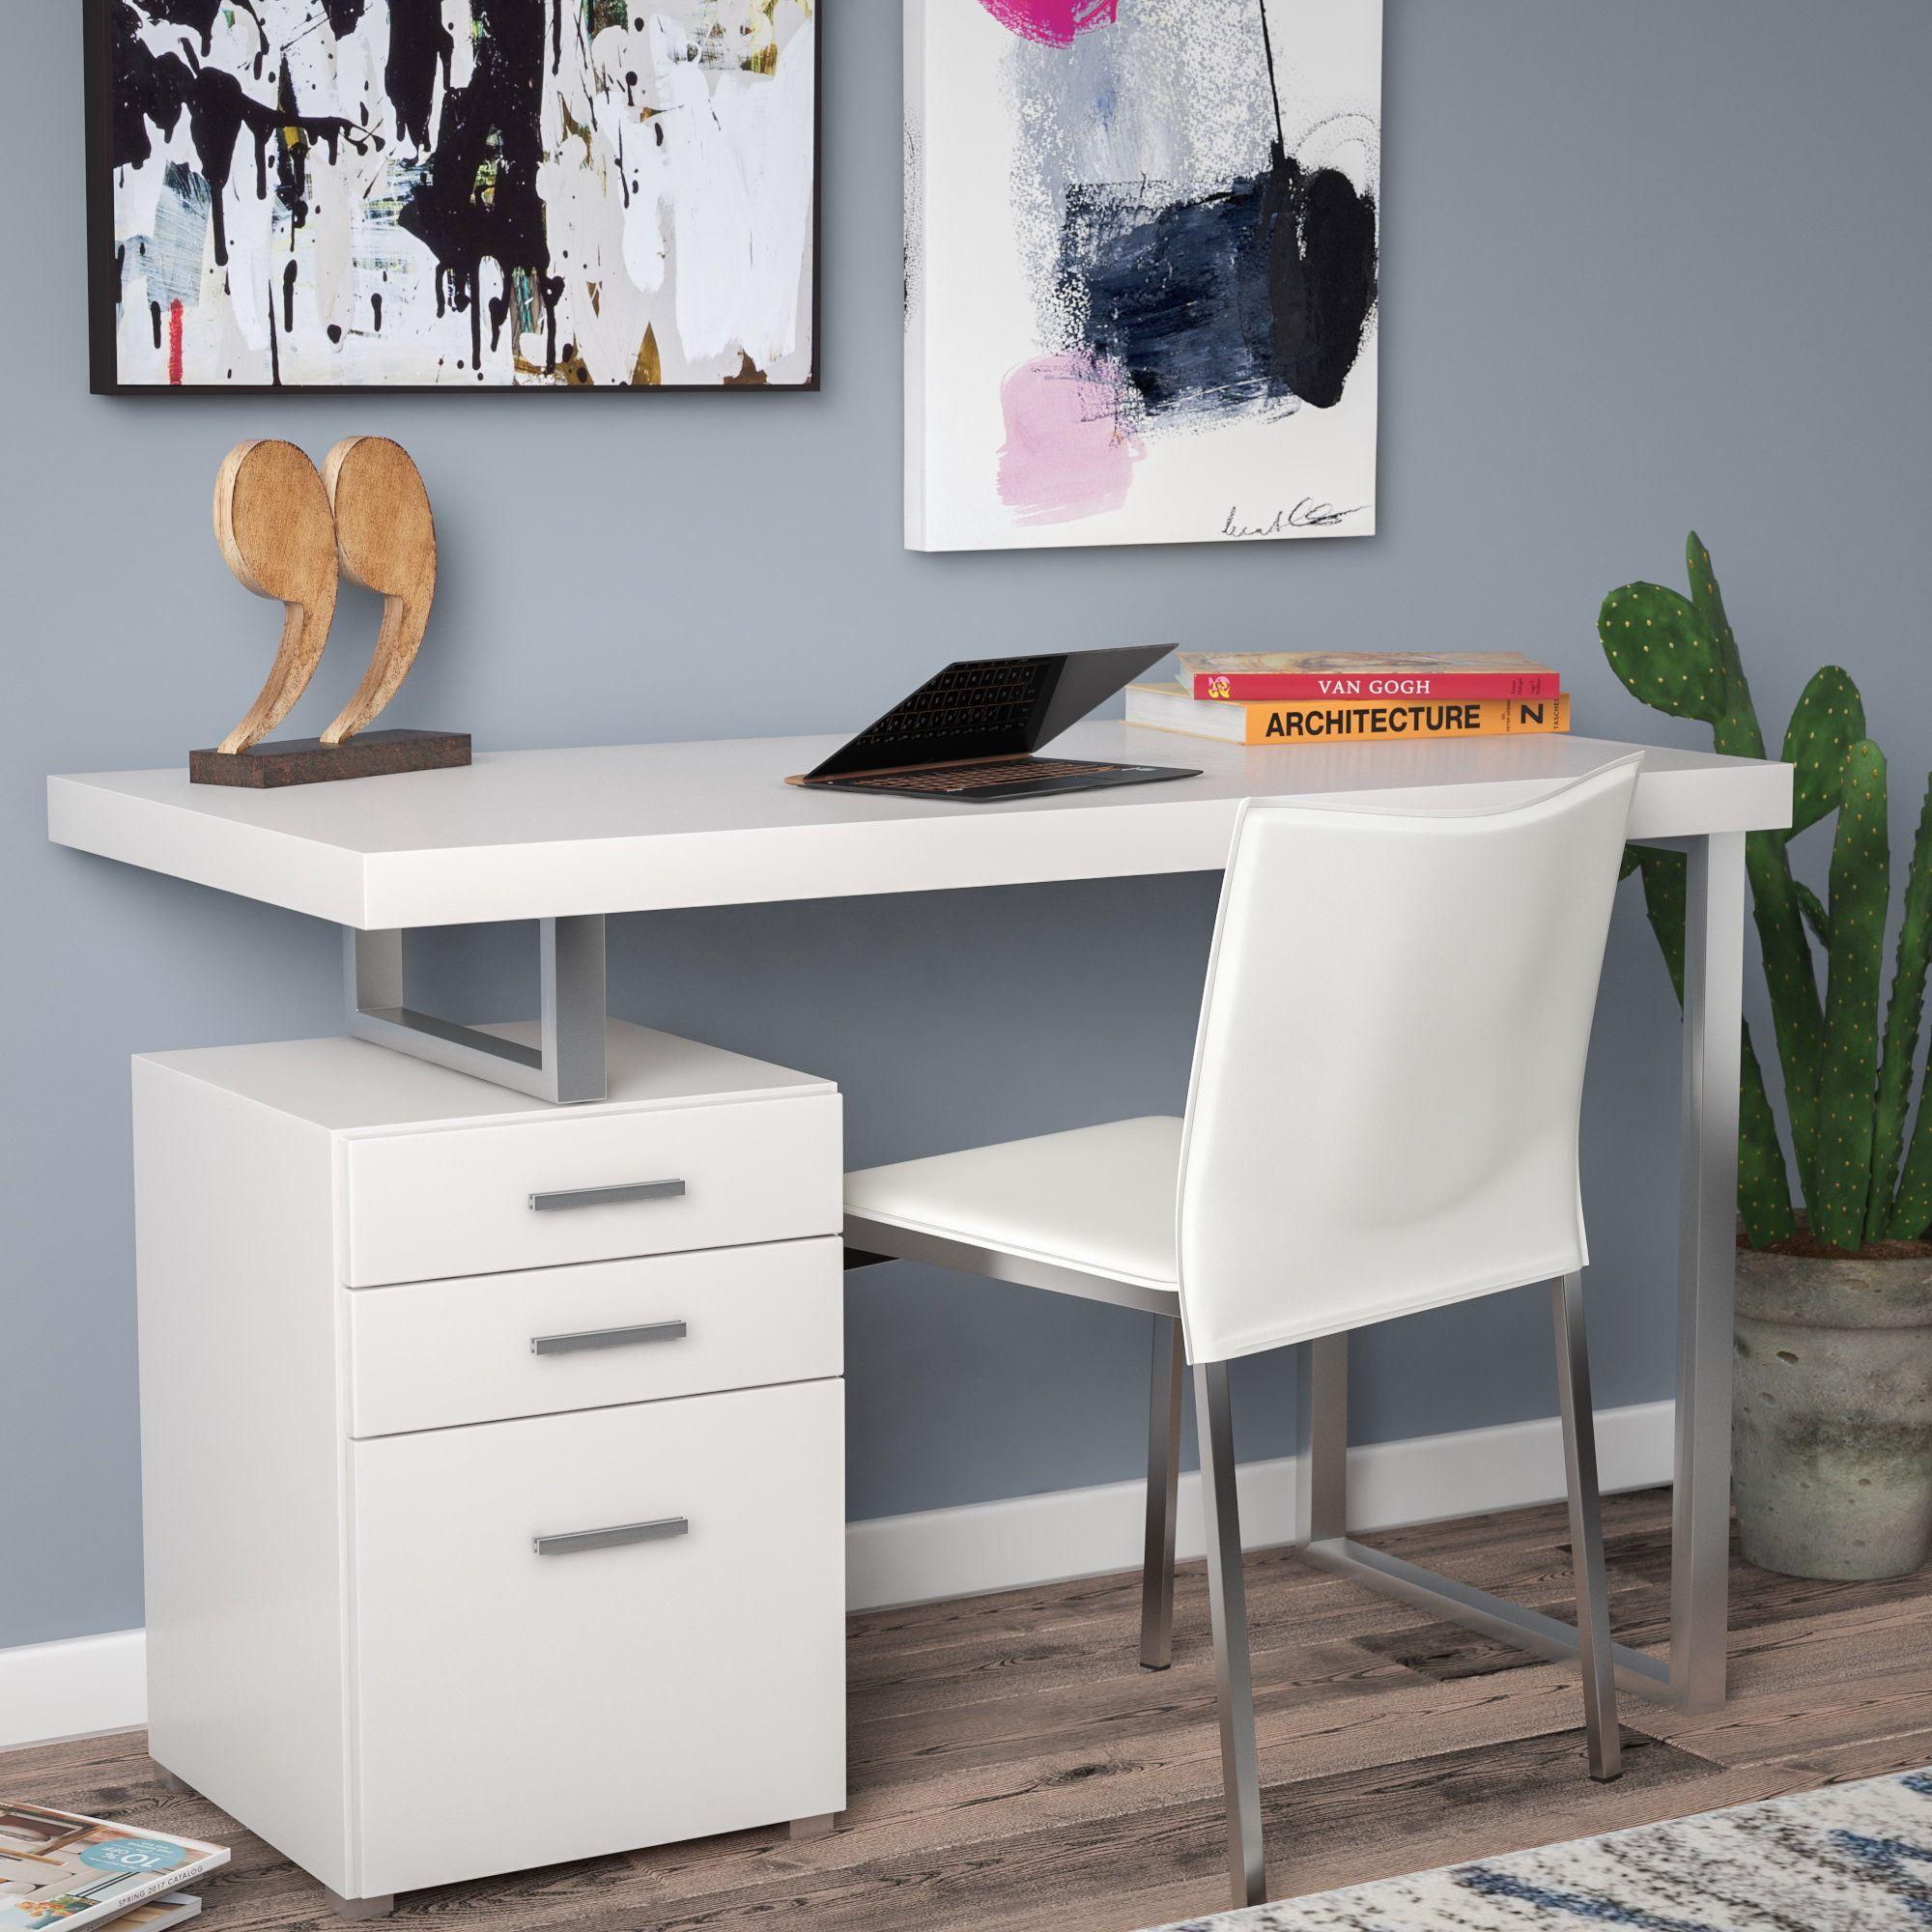 ideas mobile interior stylish designs rolling decorating desks computer arch design office looks altra contemporary desk